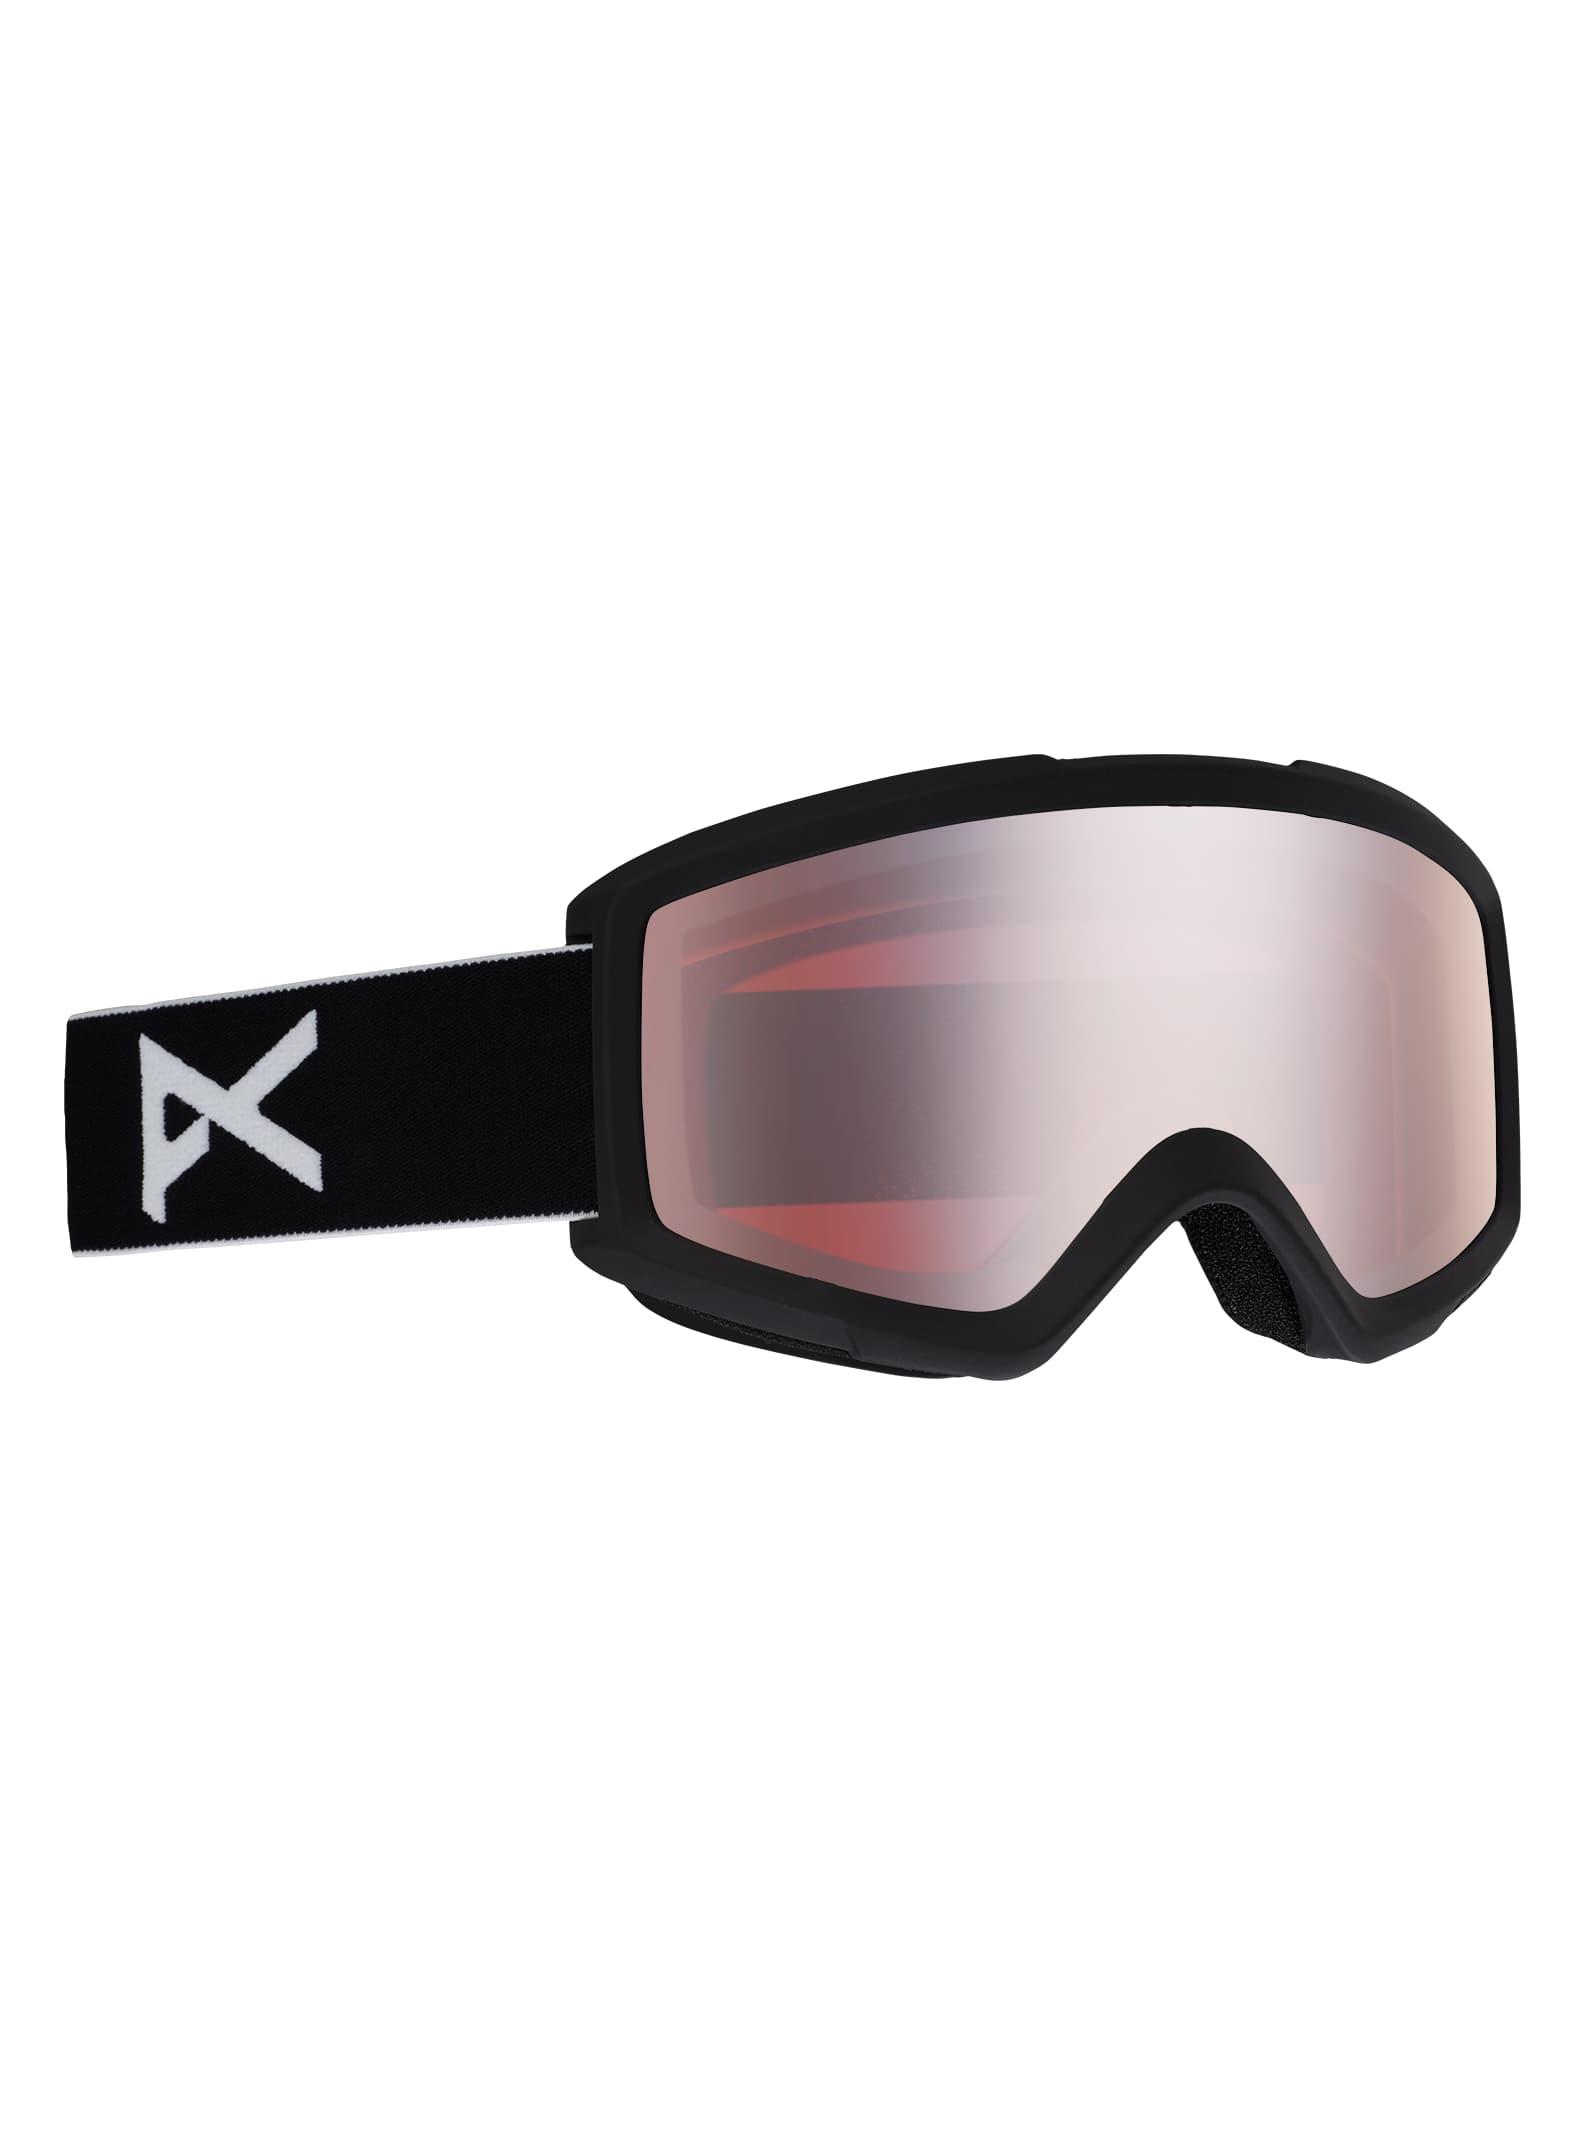 Anon Helix för herrar 2,0 skidglasögon + reservlins, Frame: Black, Lens: Silver Amber, Spare Lens: Amber